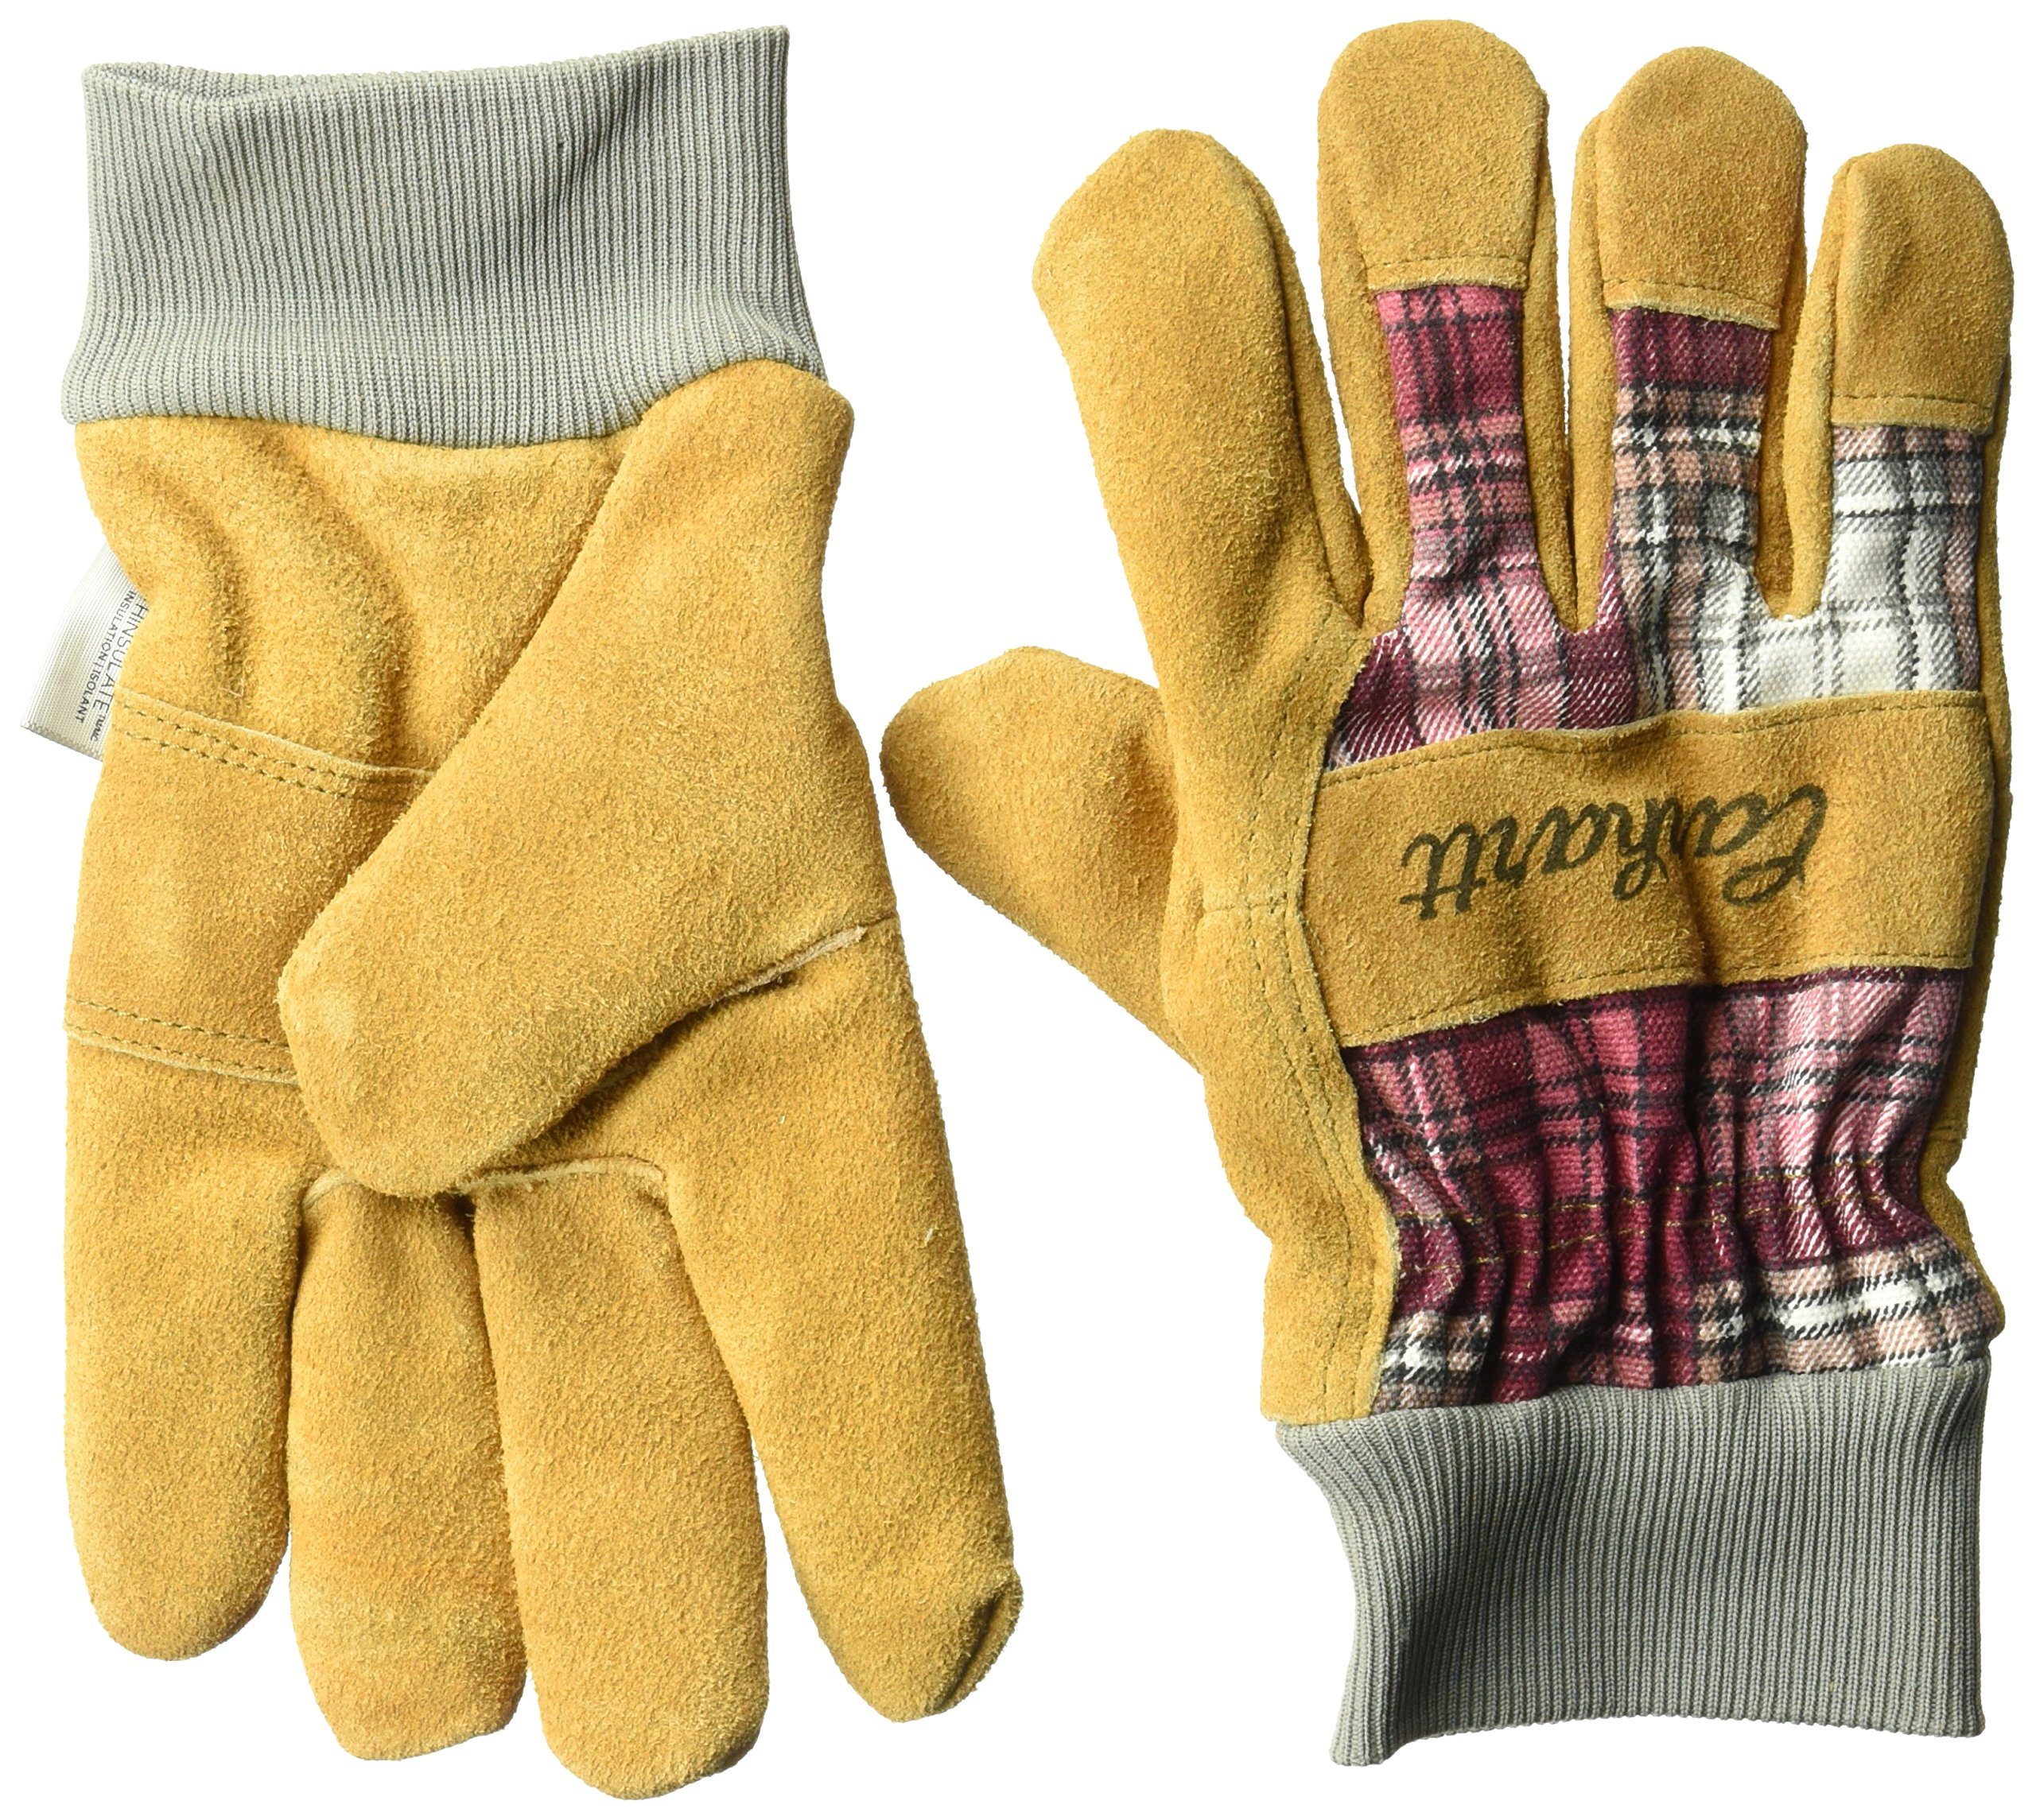 Carhartt Women's Insulated Suede Work Glove With Knit Cuff, Wild Rose Plaid, S